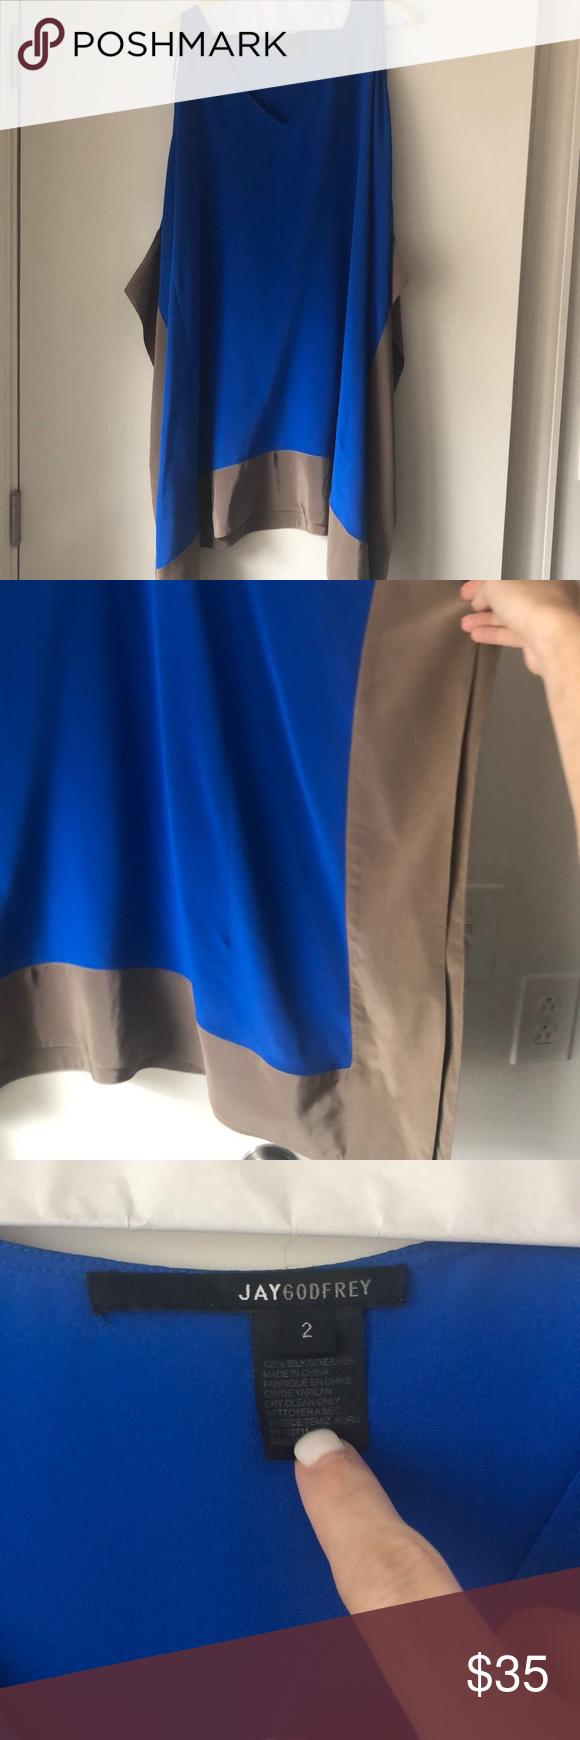 JAY GODFREY colorblock swing dress size 2